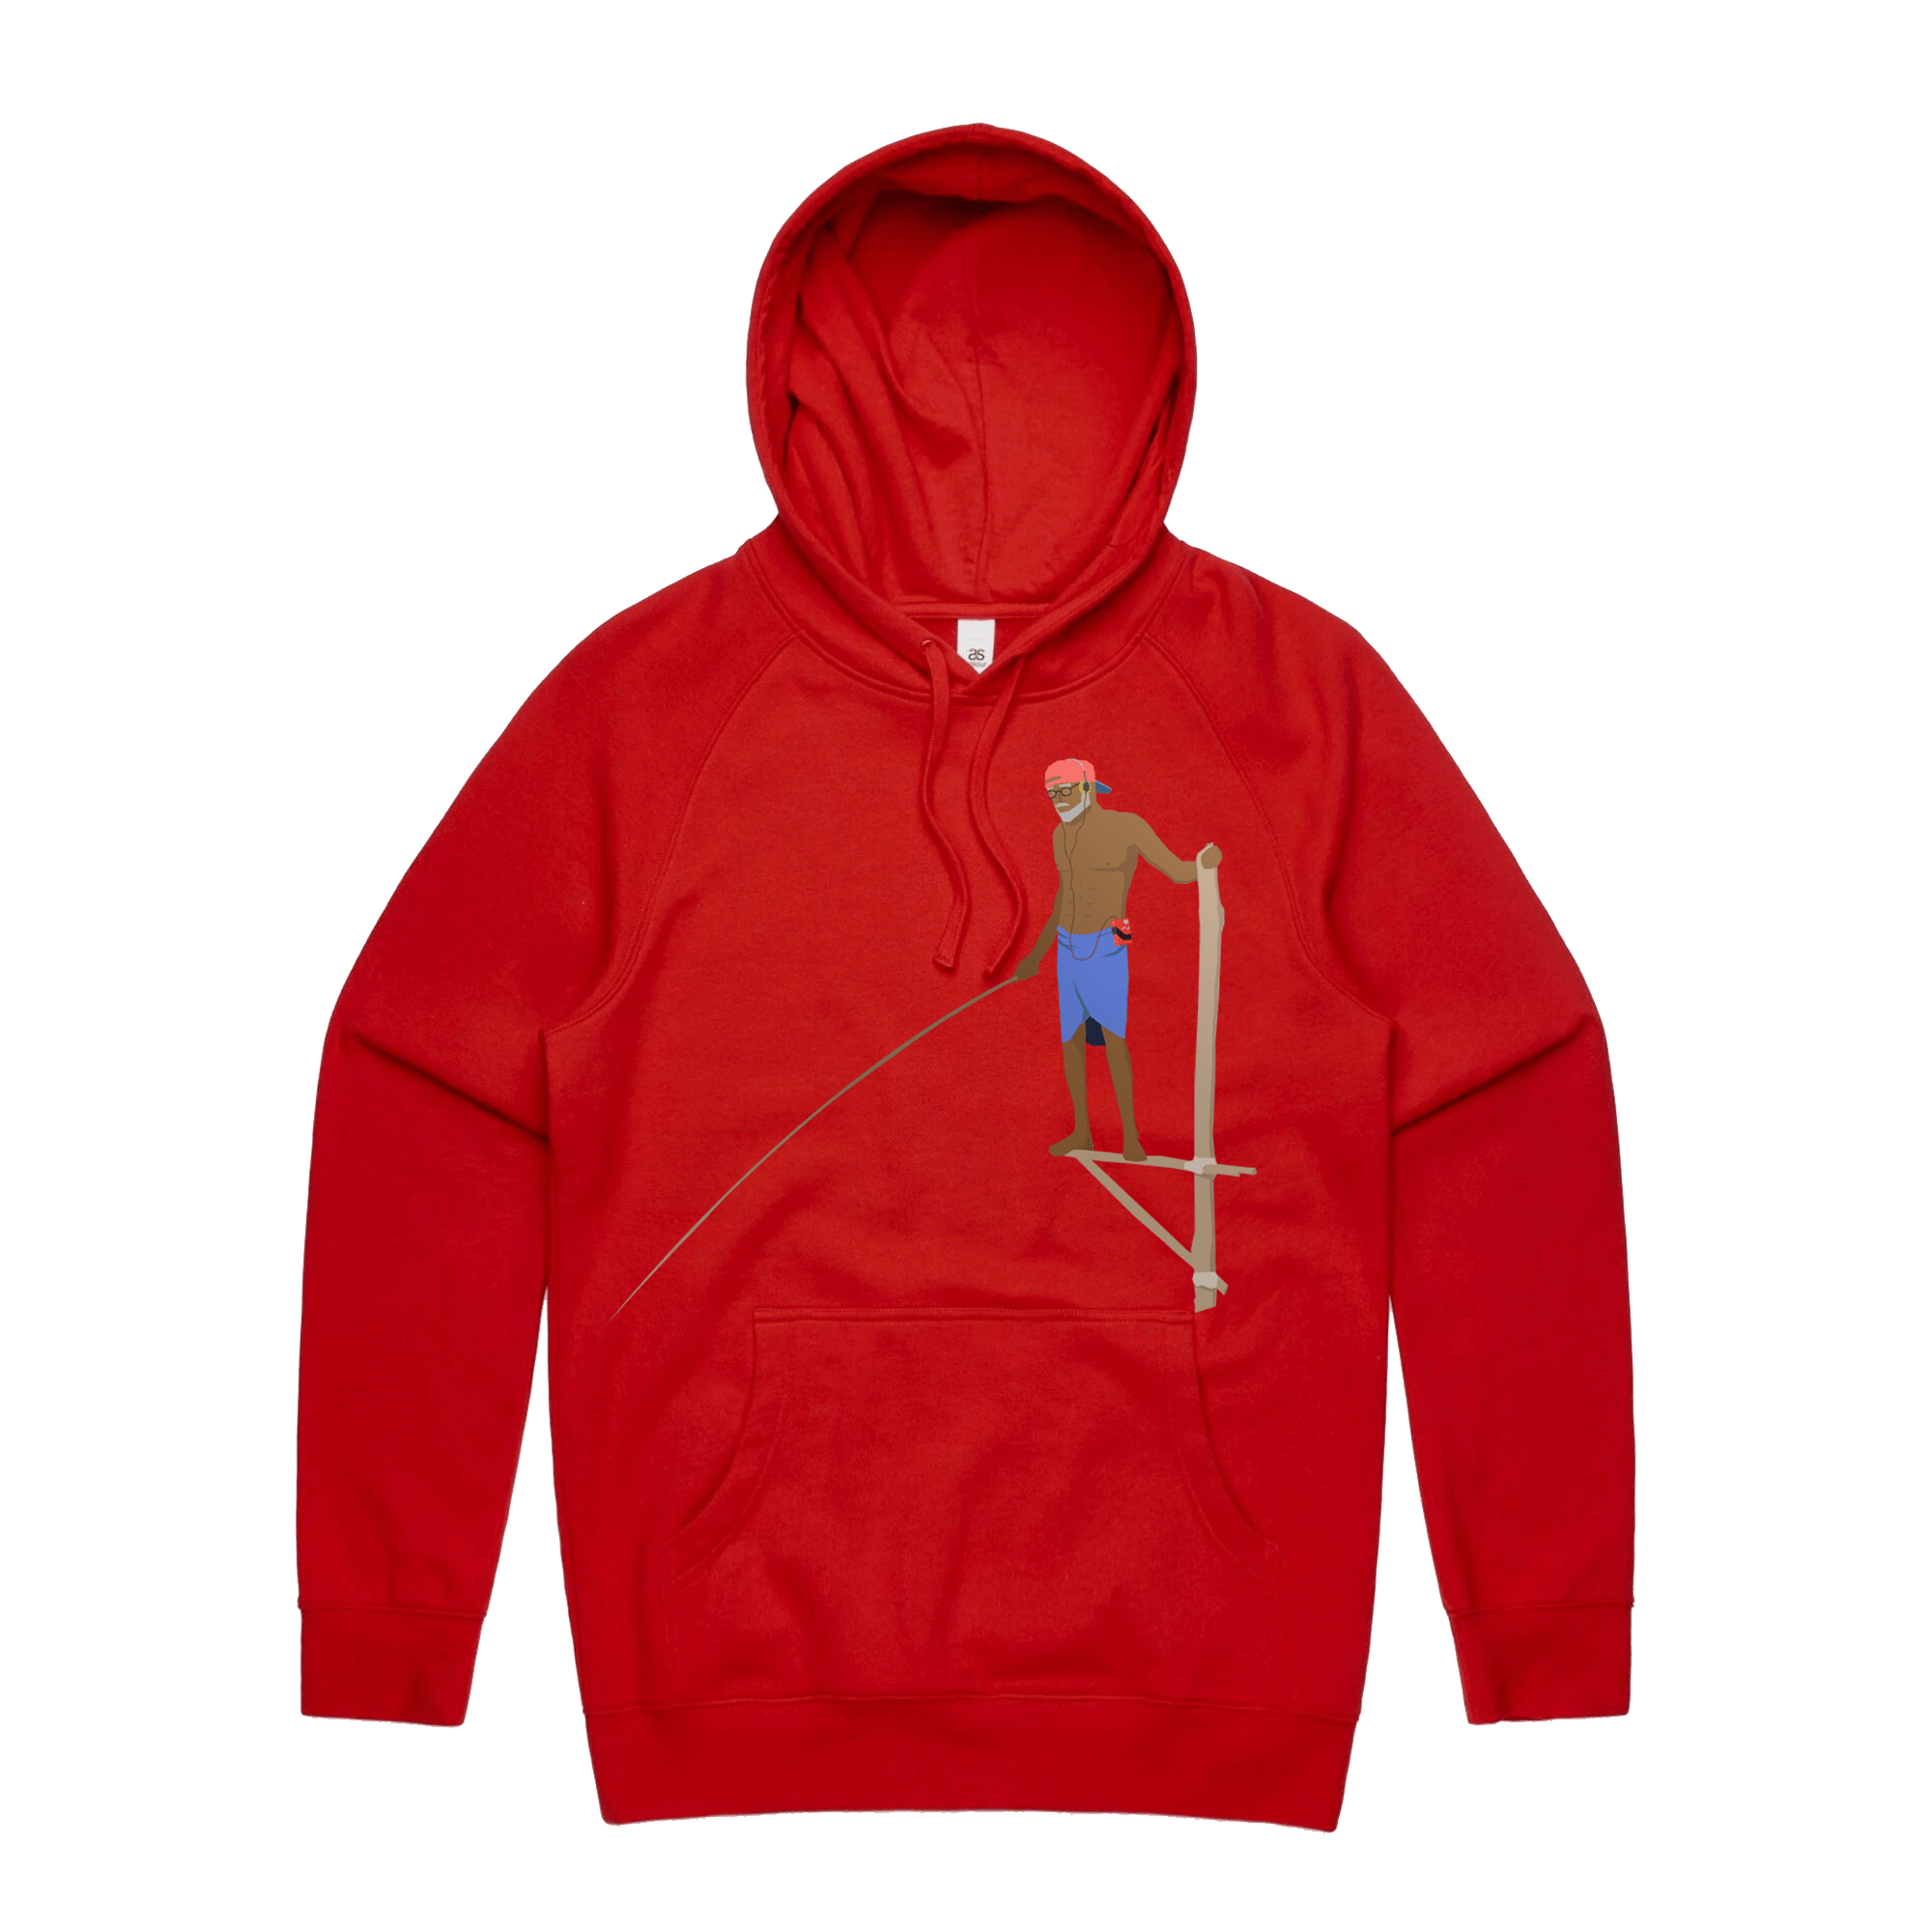 RETRO FISHERMAN Hoodie - RED